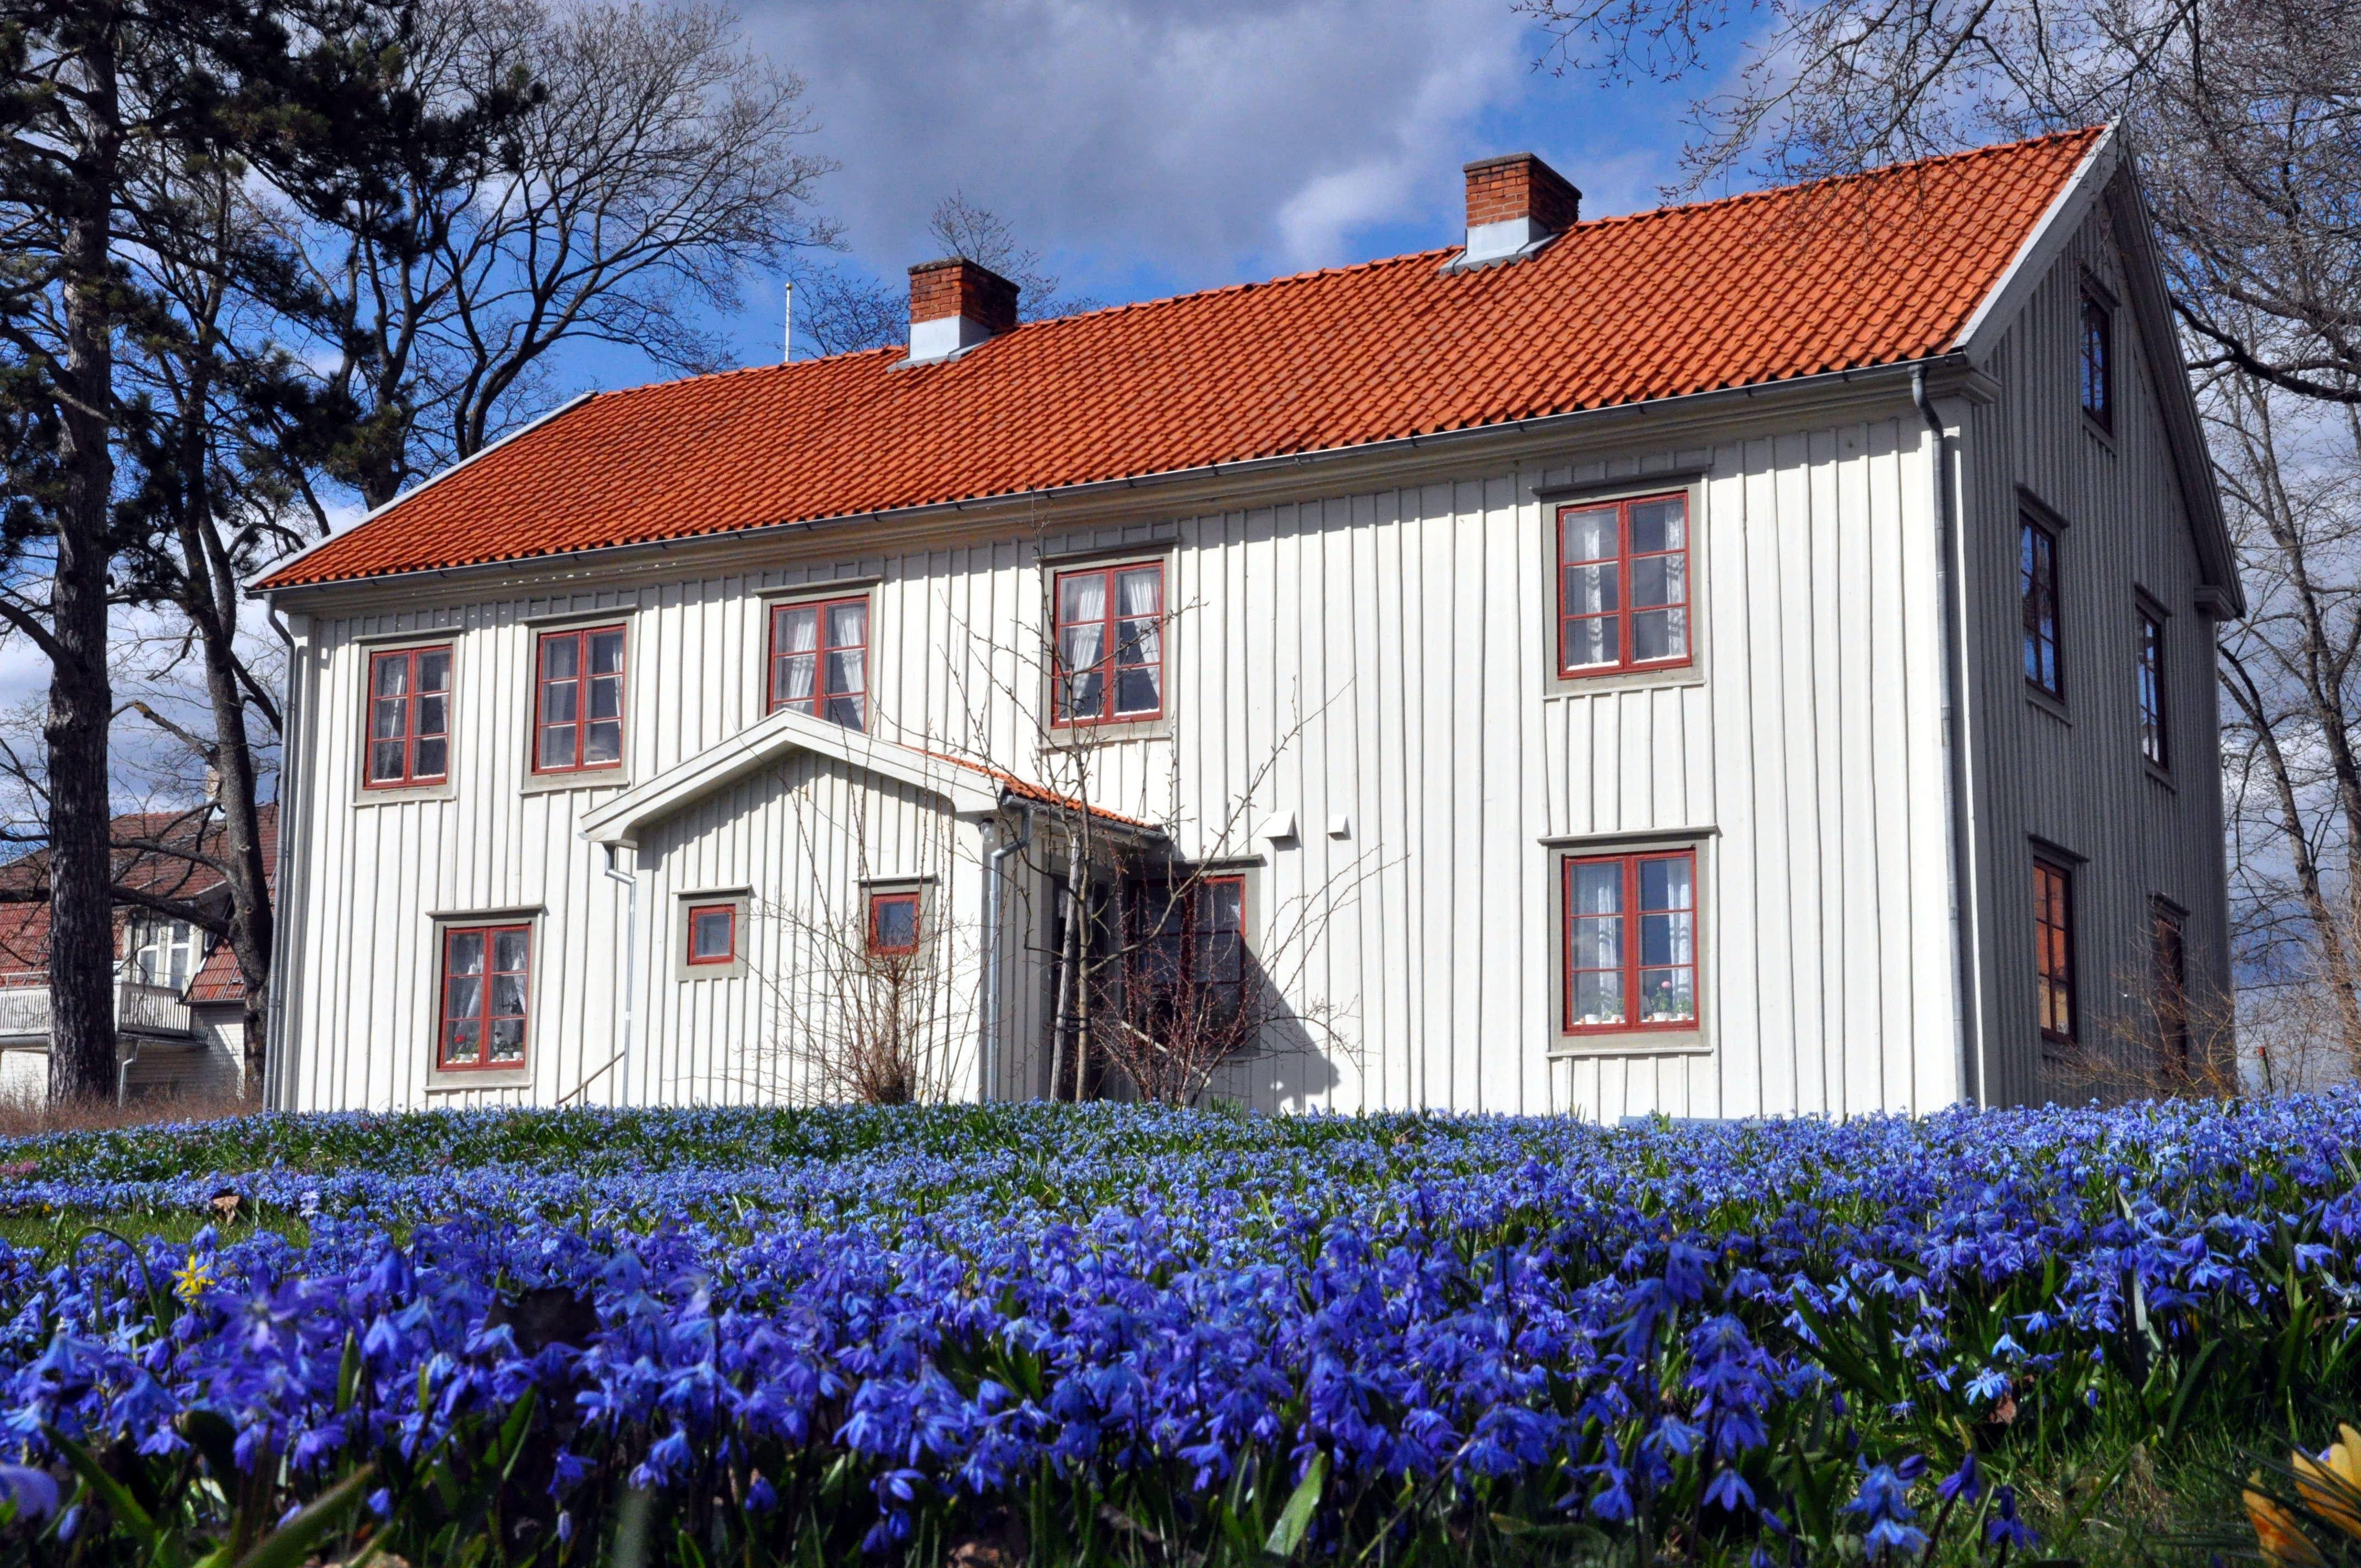 Per-Olof Persson, Sensommarfest på Olssonska gården